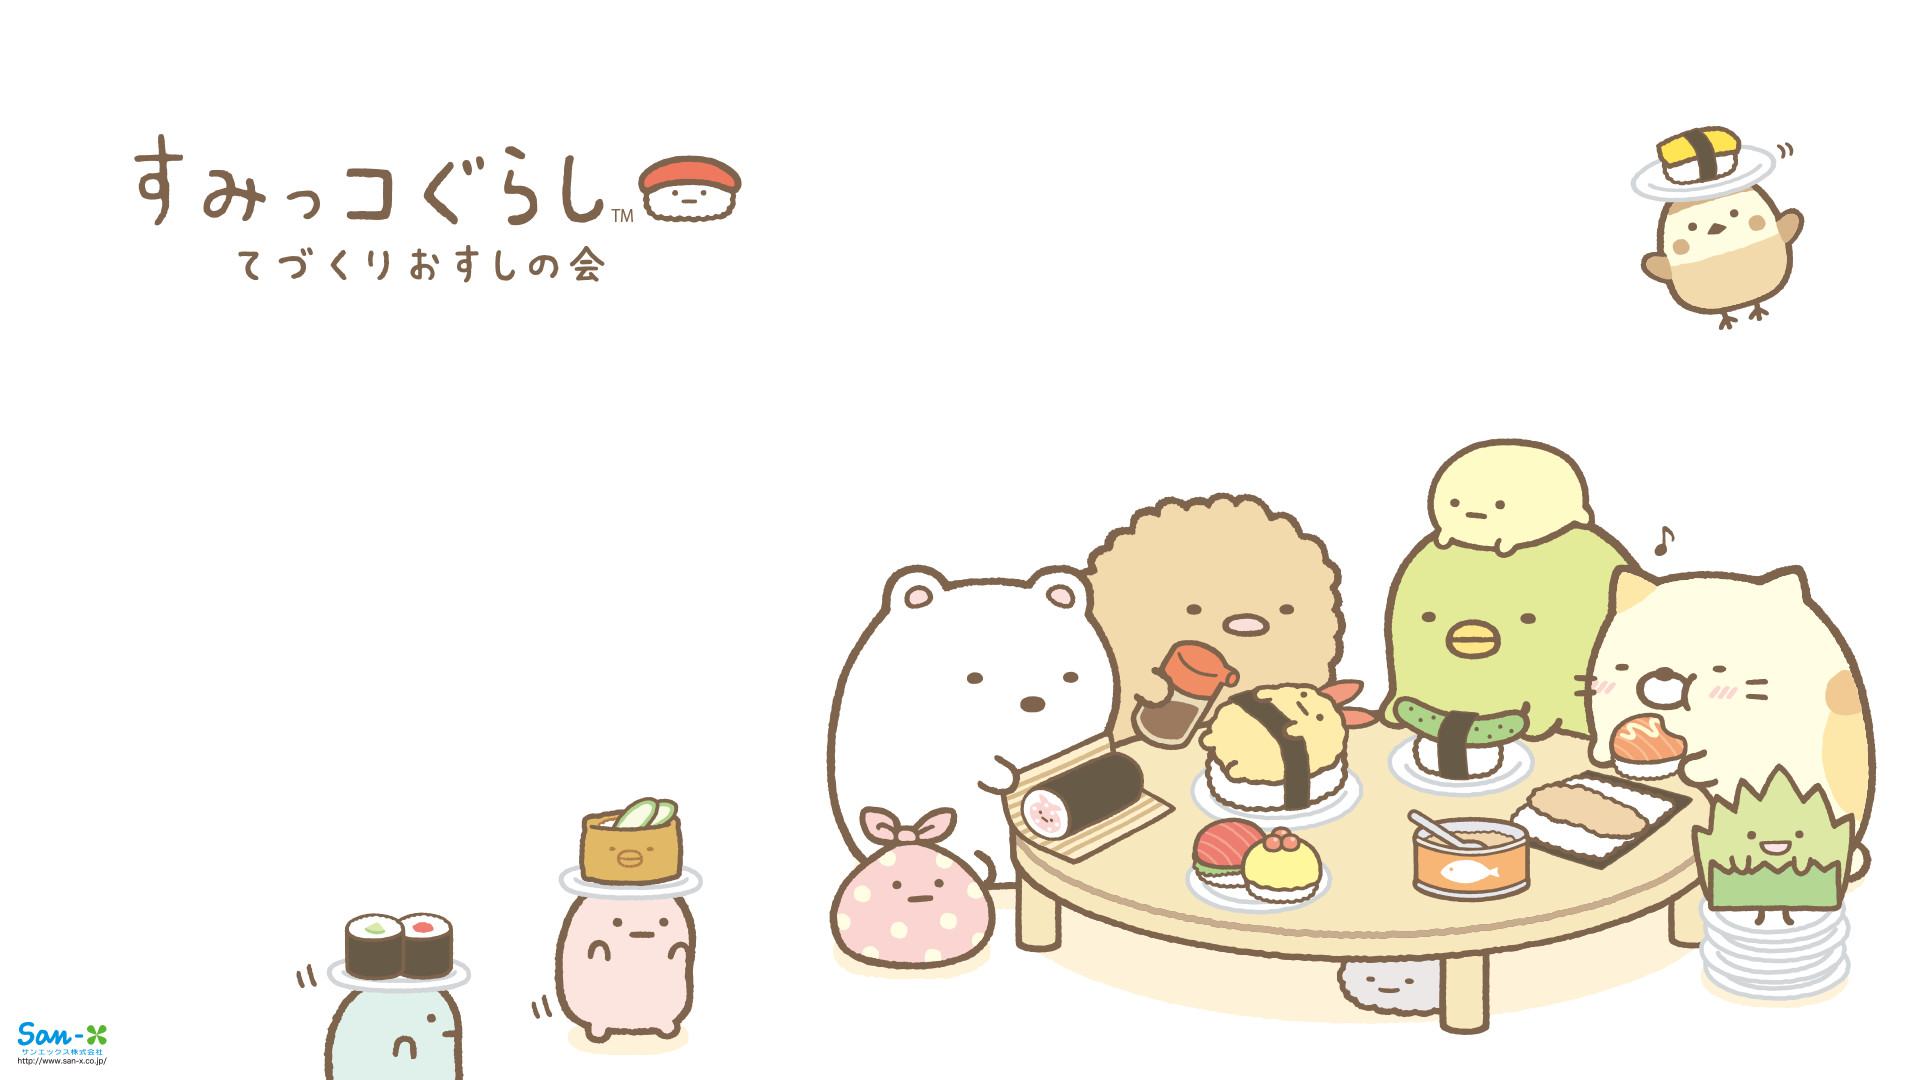 10 best summiko gurashi cuties images on Pinterest   Sanrio, Pusheen and  Rilakkuma